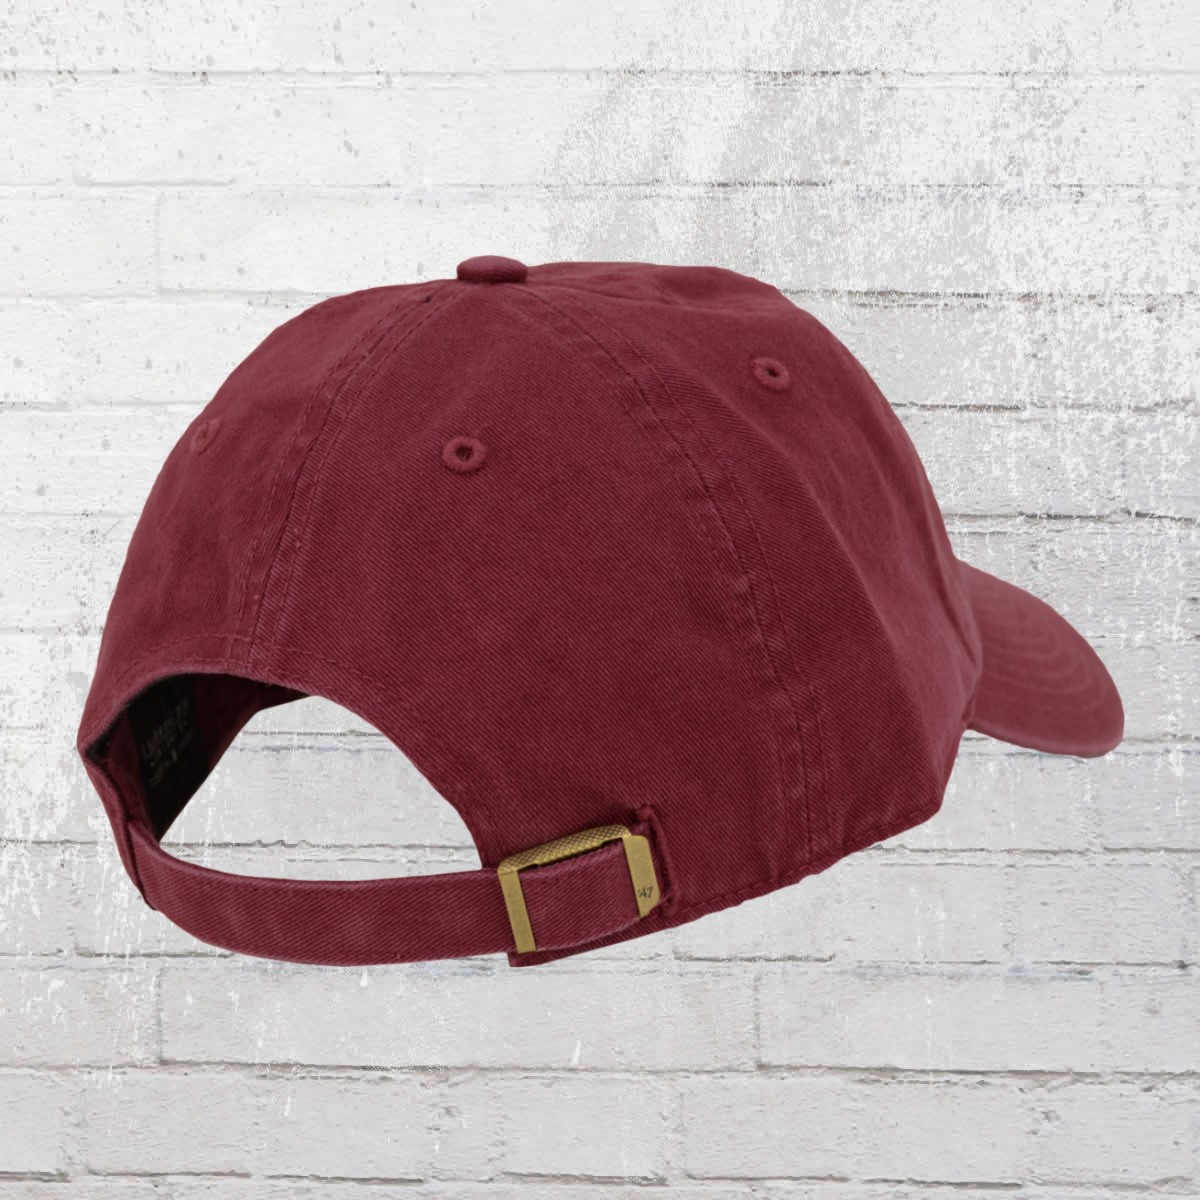 e3f2463a640 Have you seen  47 Brand MLB New York Yankees Snapback Baseball Hat ...